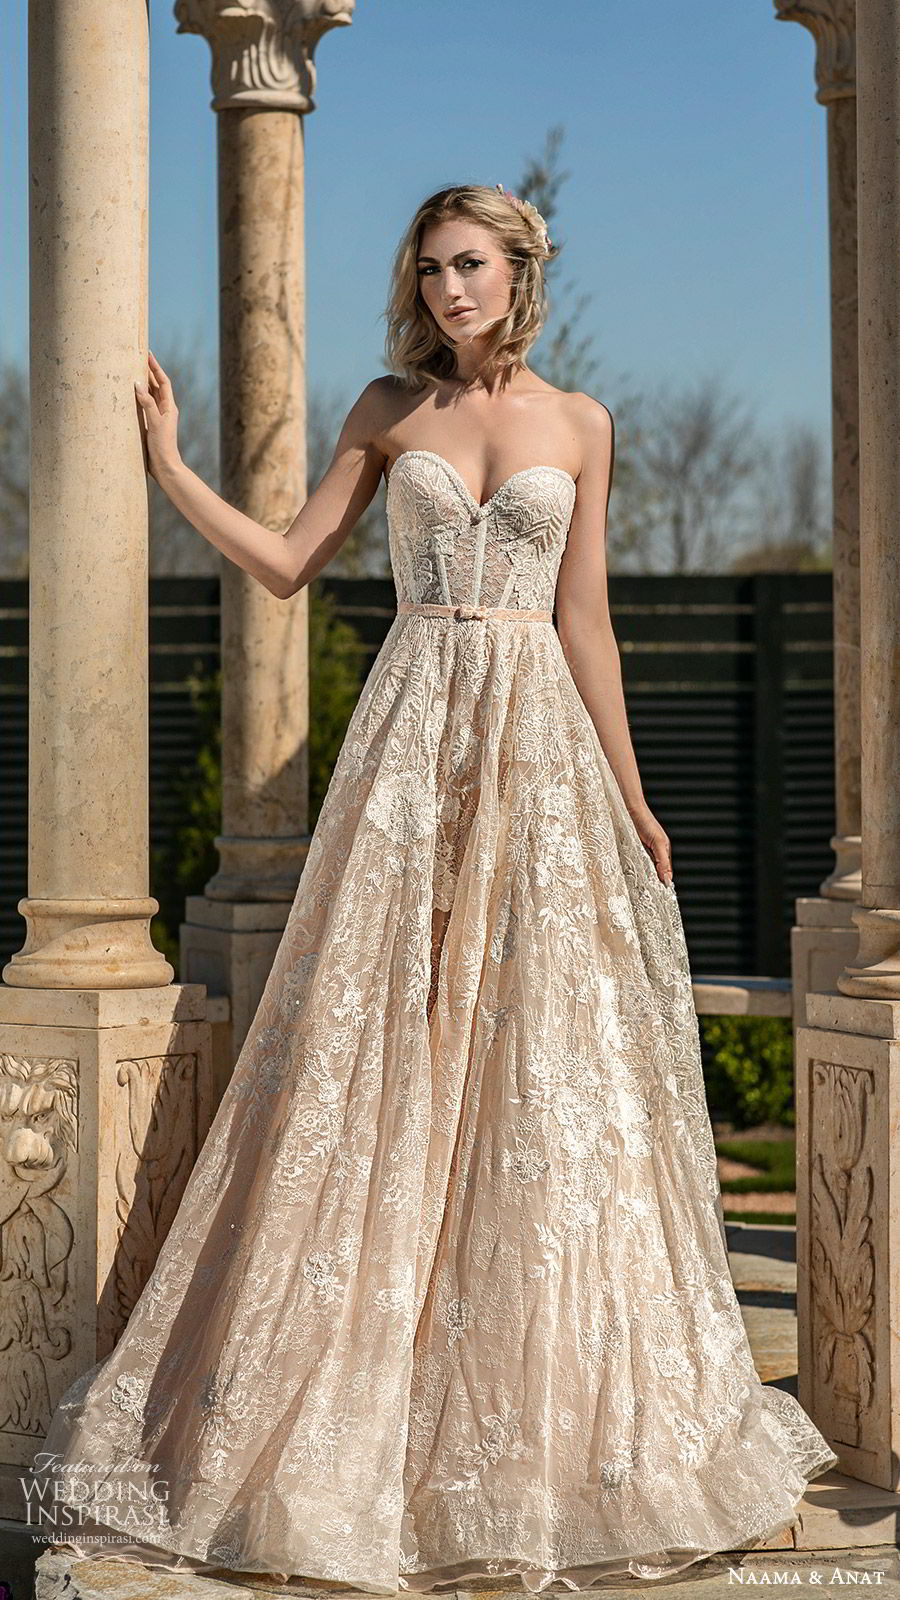 naama anat spring 2020 bridal strapless sweetheart fully embellished a line ball gown wedding dress (3) sweep train romantic elegant mv